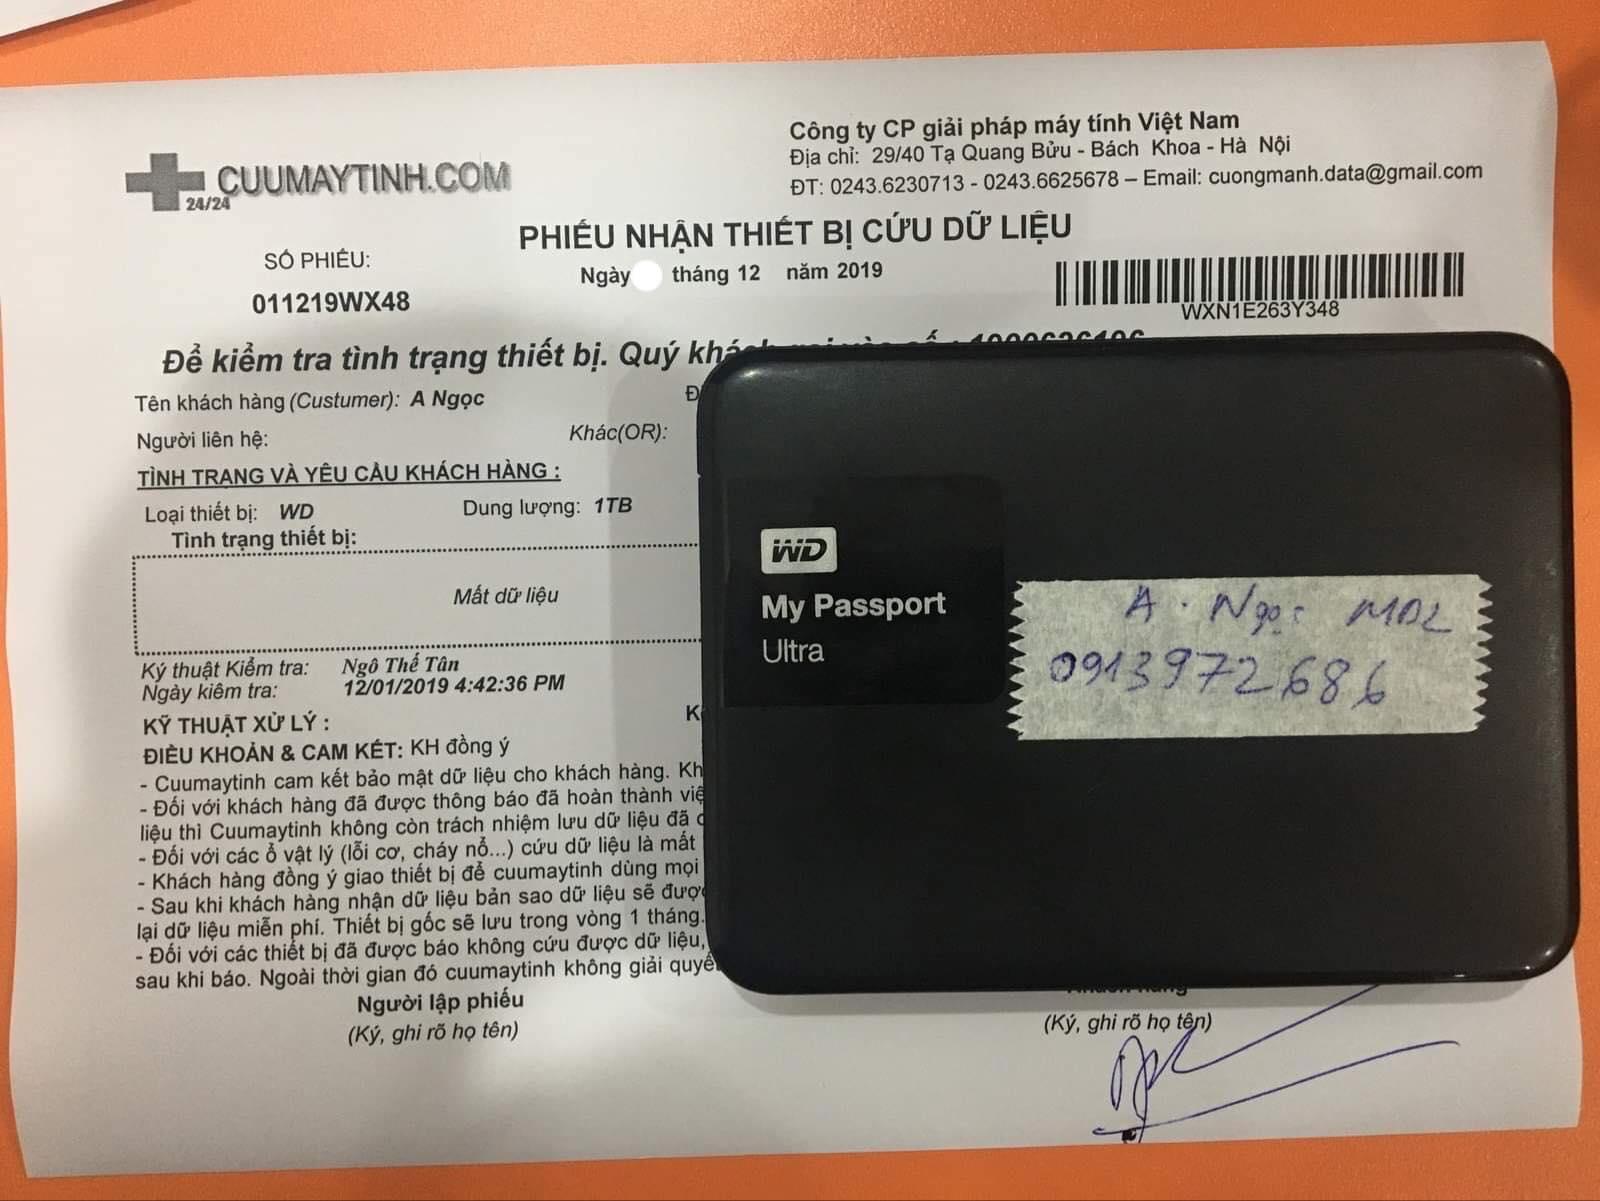 Lấy dữ liệu ổ cứng Western 1TB xóa nhầm 07/12/2019 - cuumaytinh